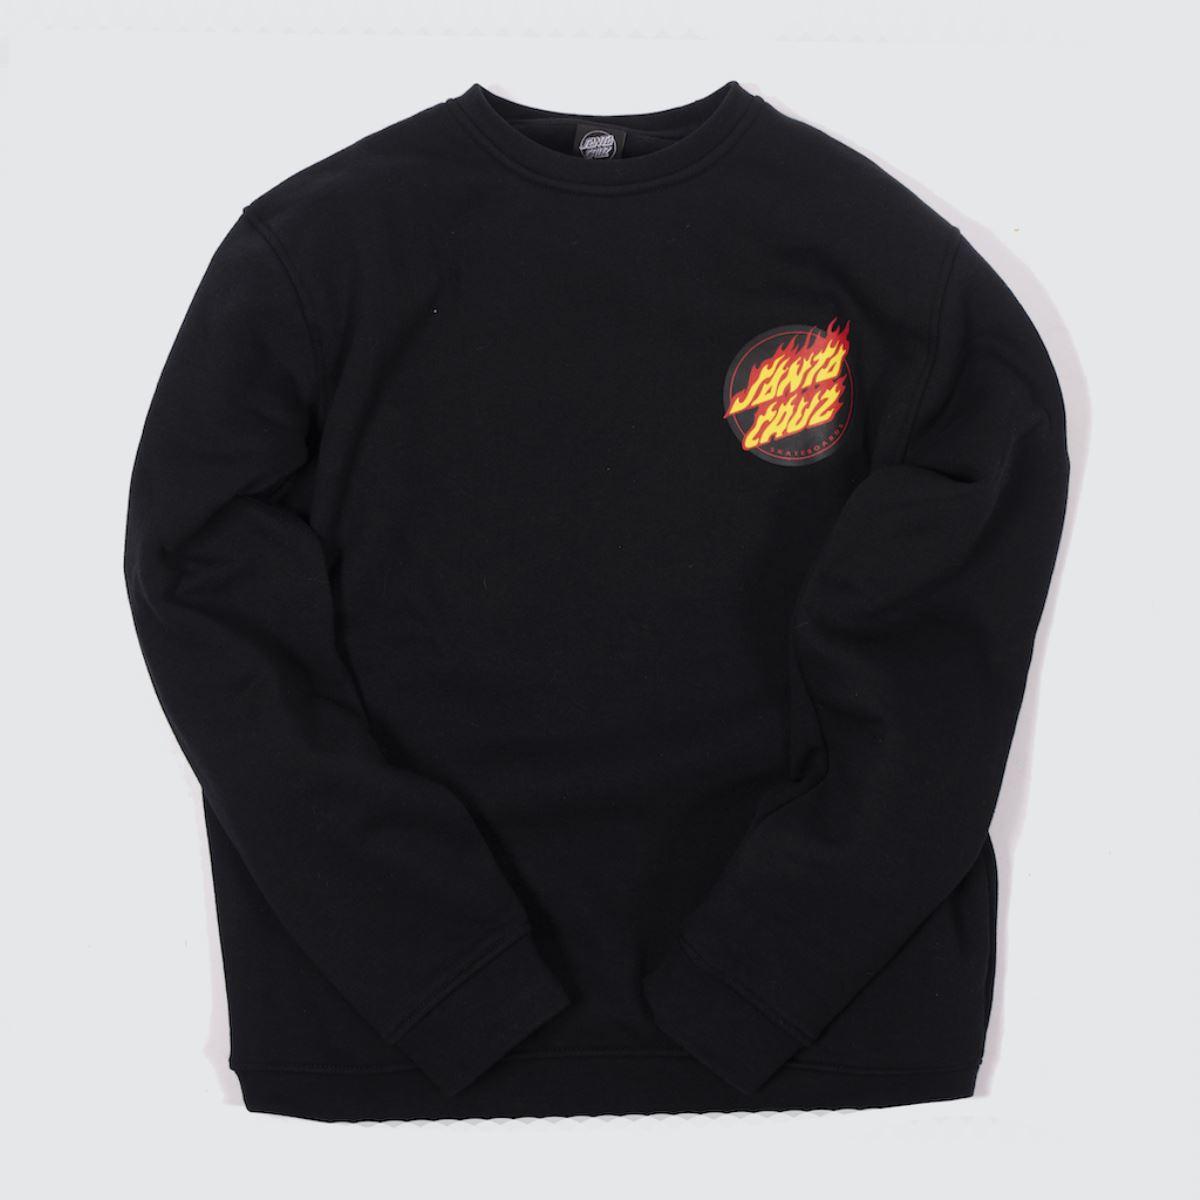 Santa Cruz Clothing Santa Cruz Black Flaming Japenese